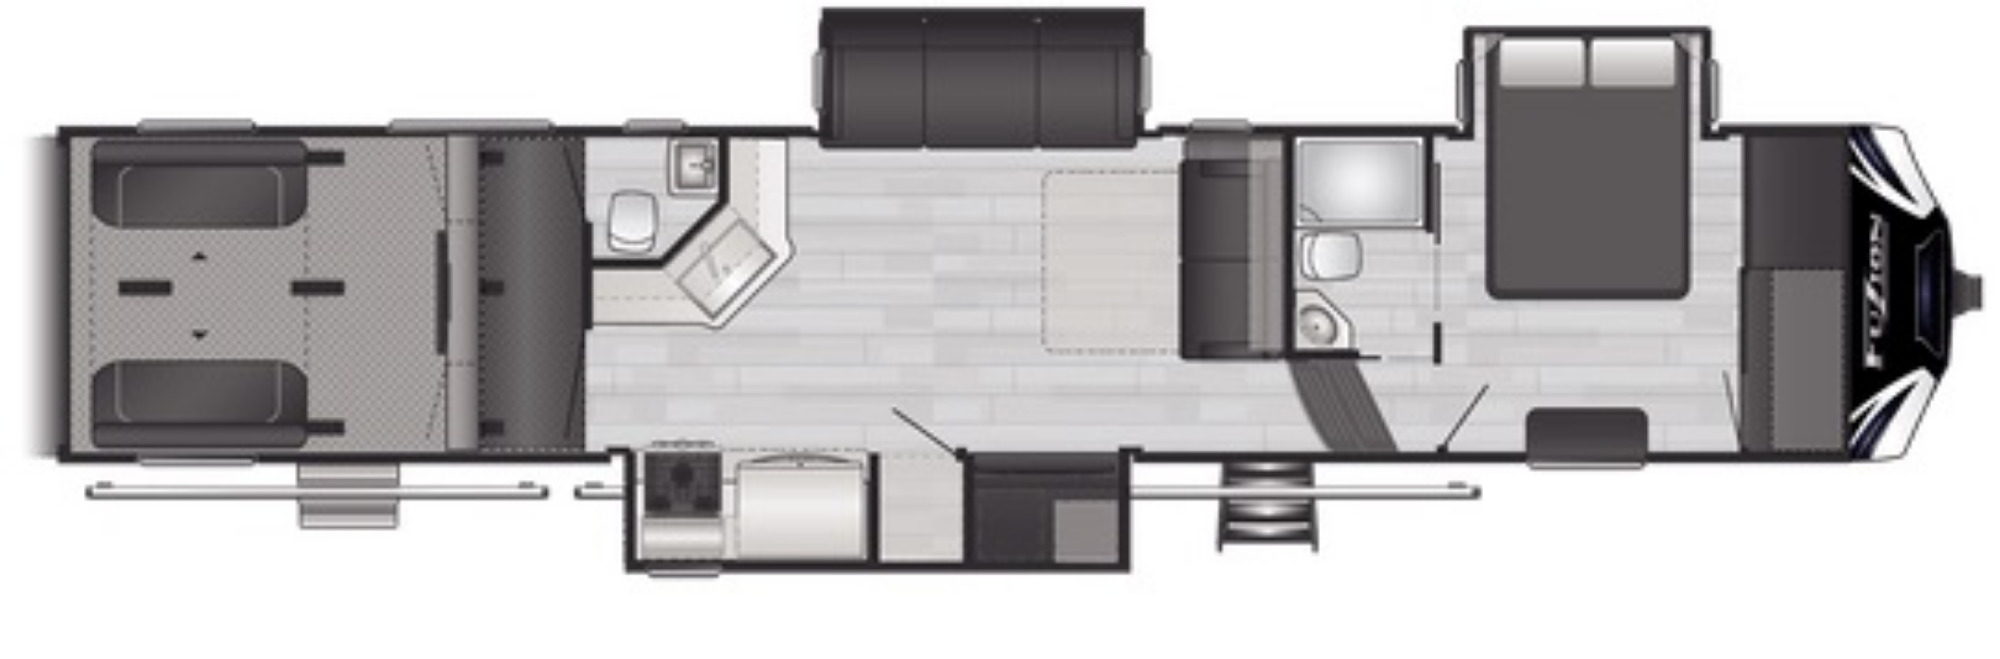 View Floor Plan for 2021 KEYSTONE FUZION 428